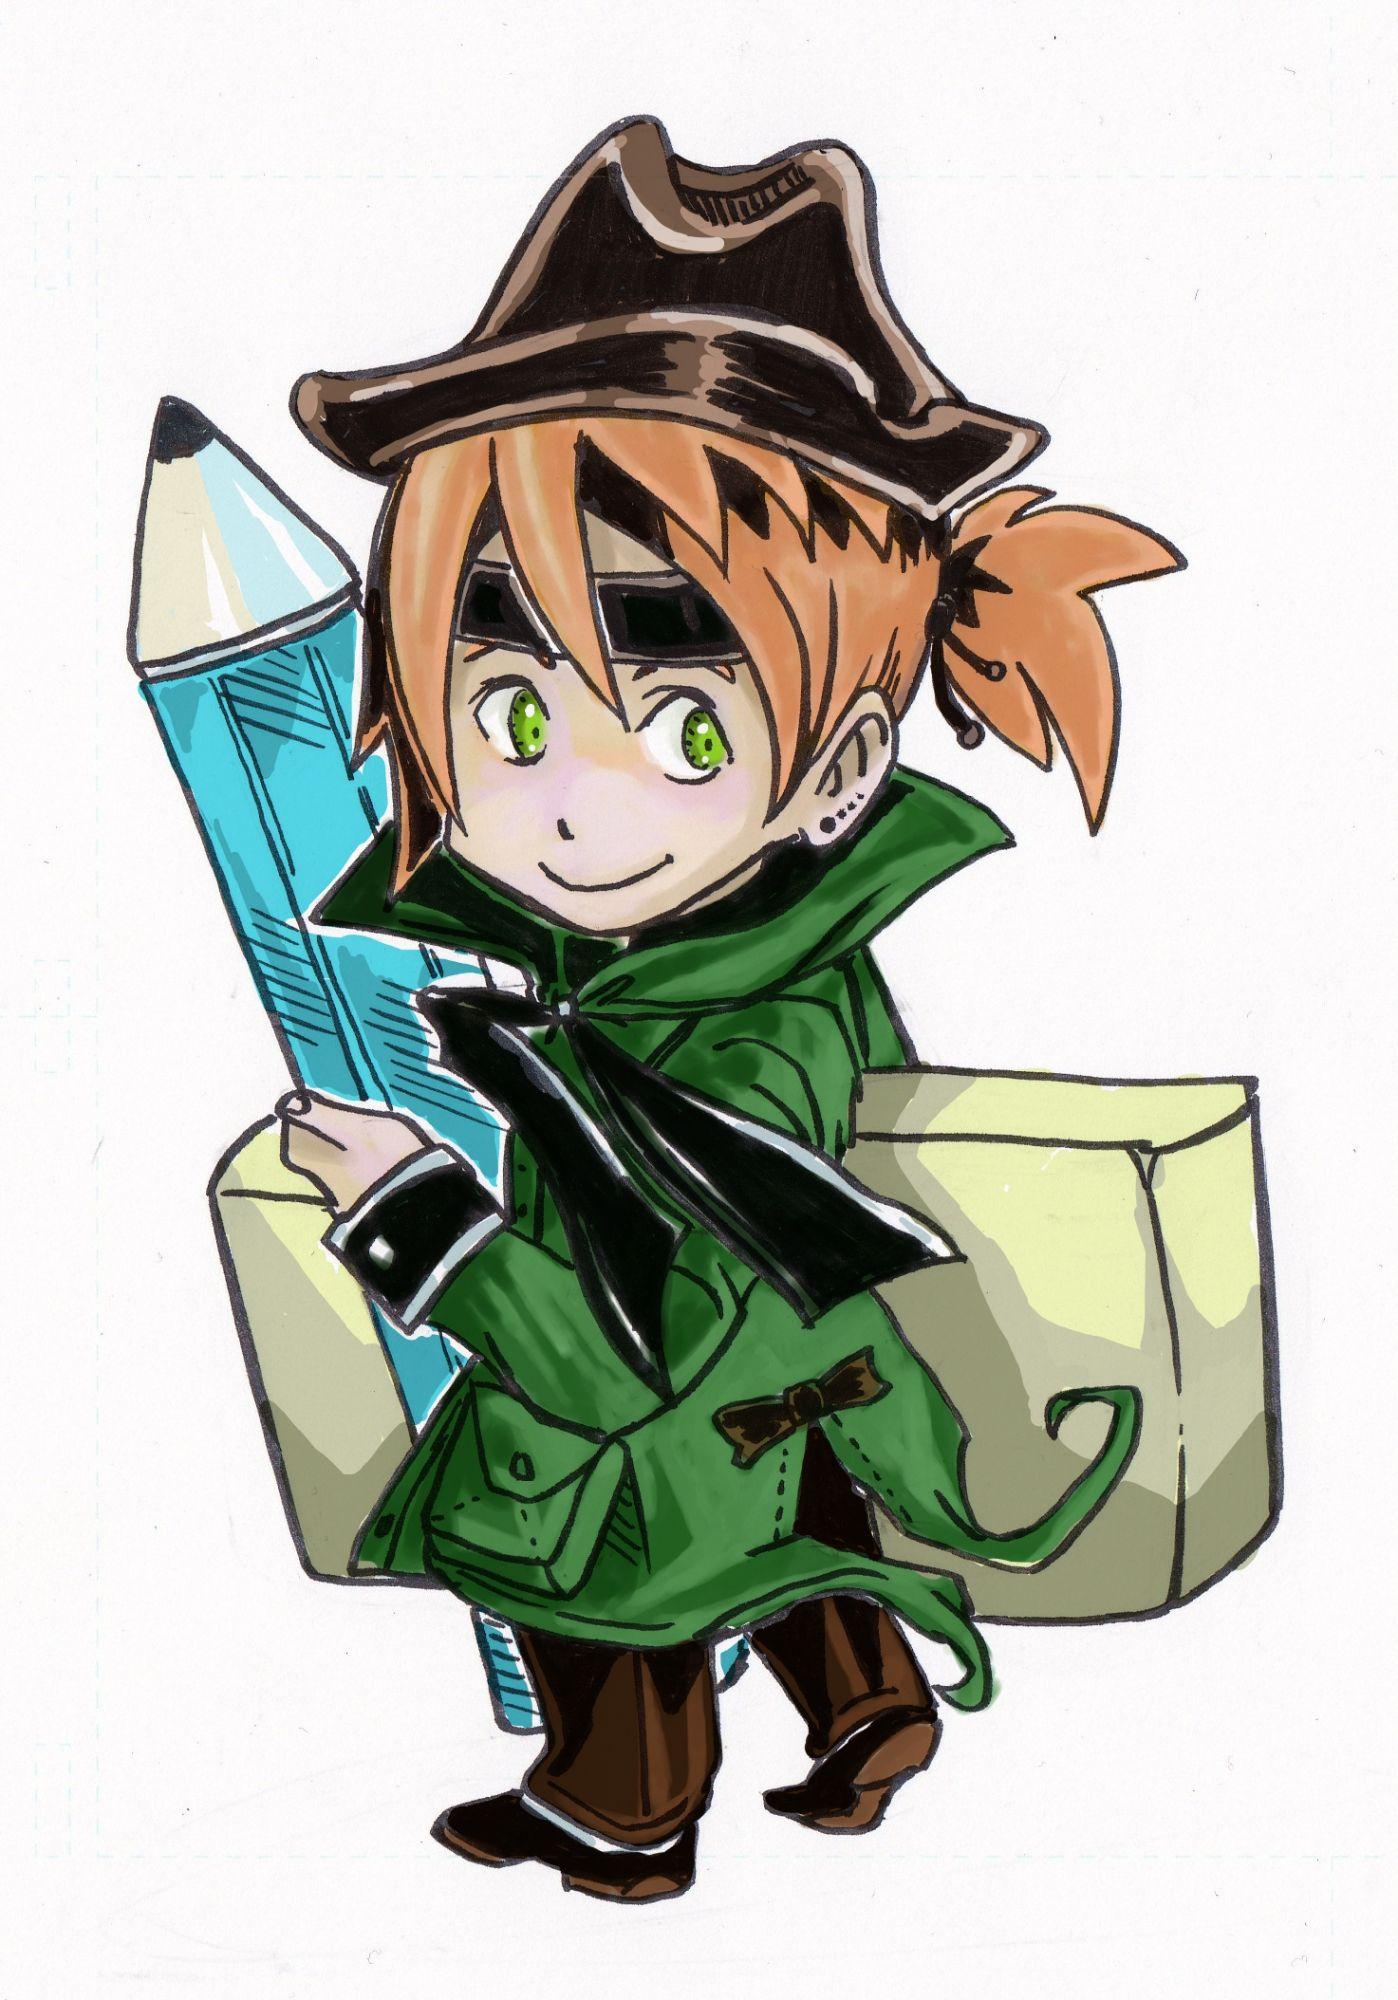 Atelier Kawaii Et Coloriage | Le Petit Agenda pour Coloriage Manga Kawaii